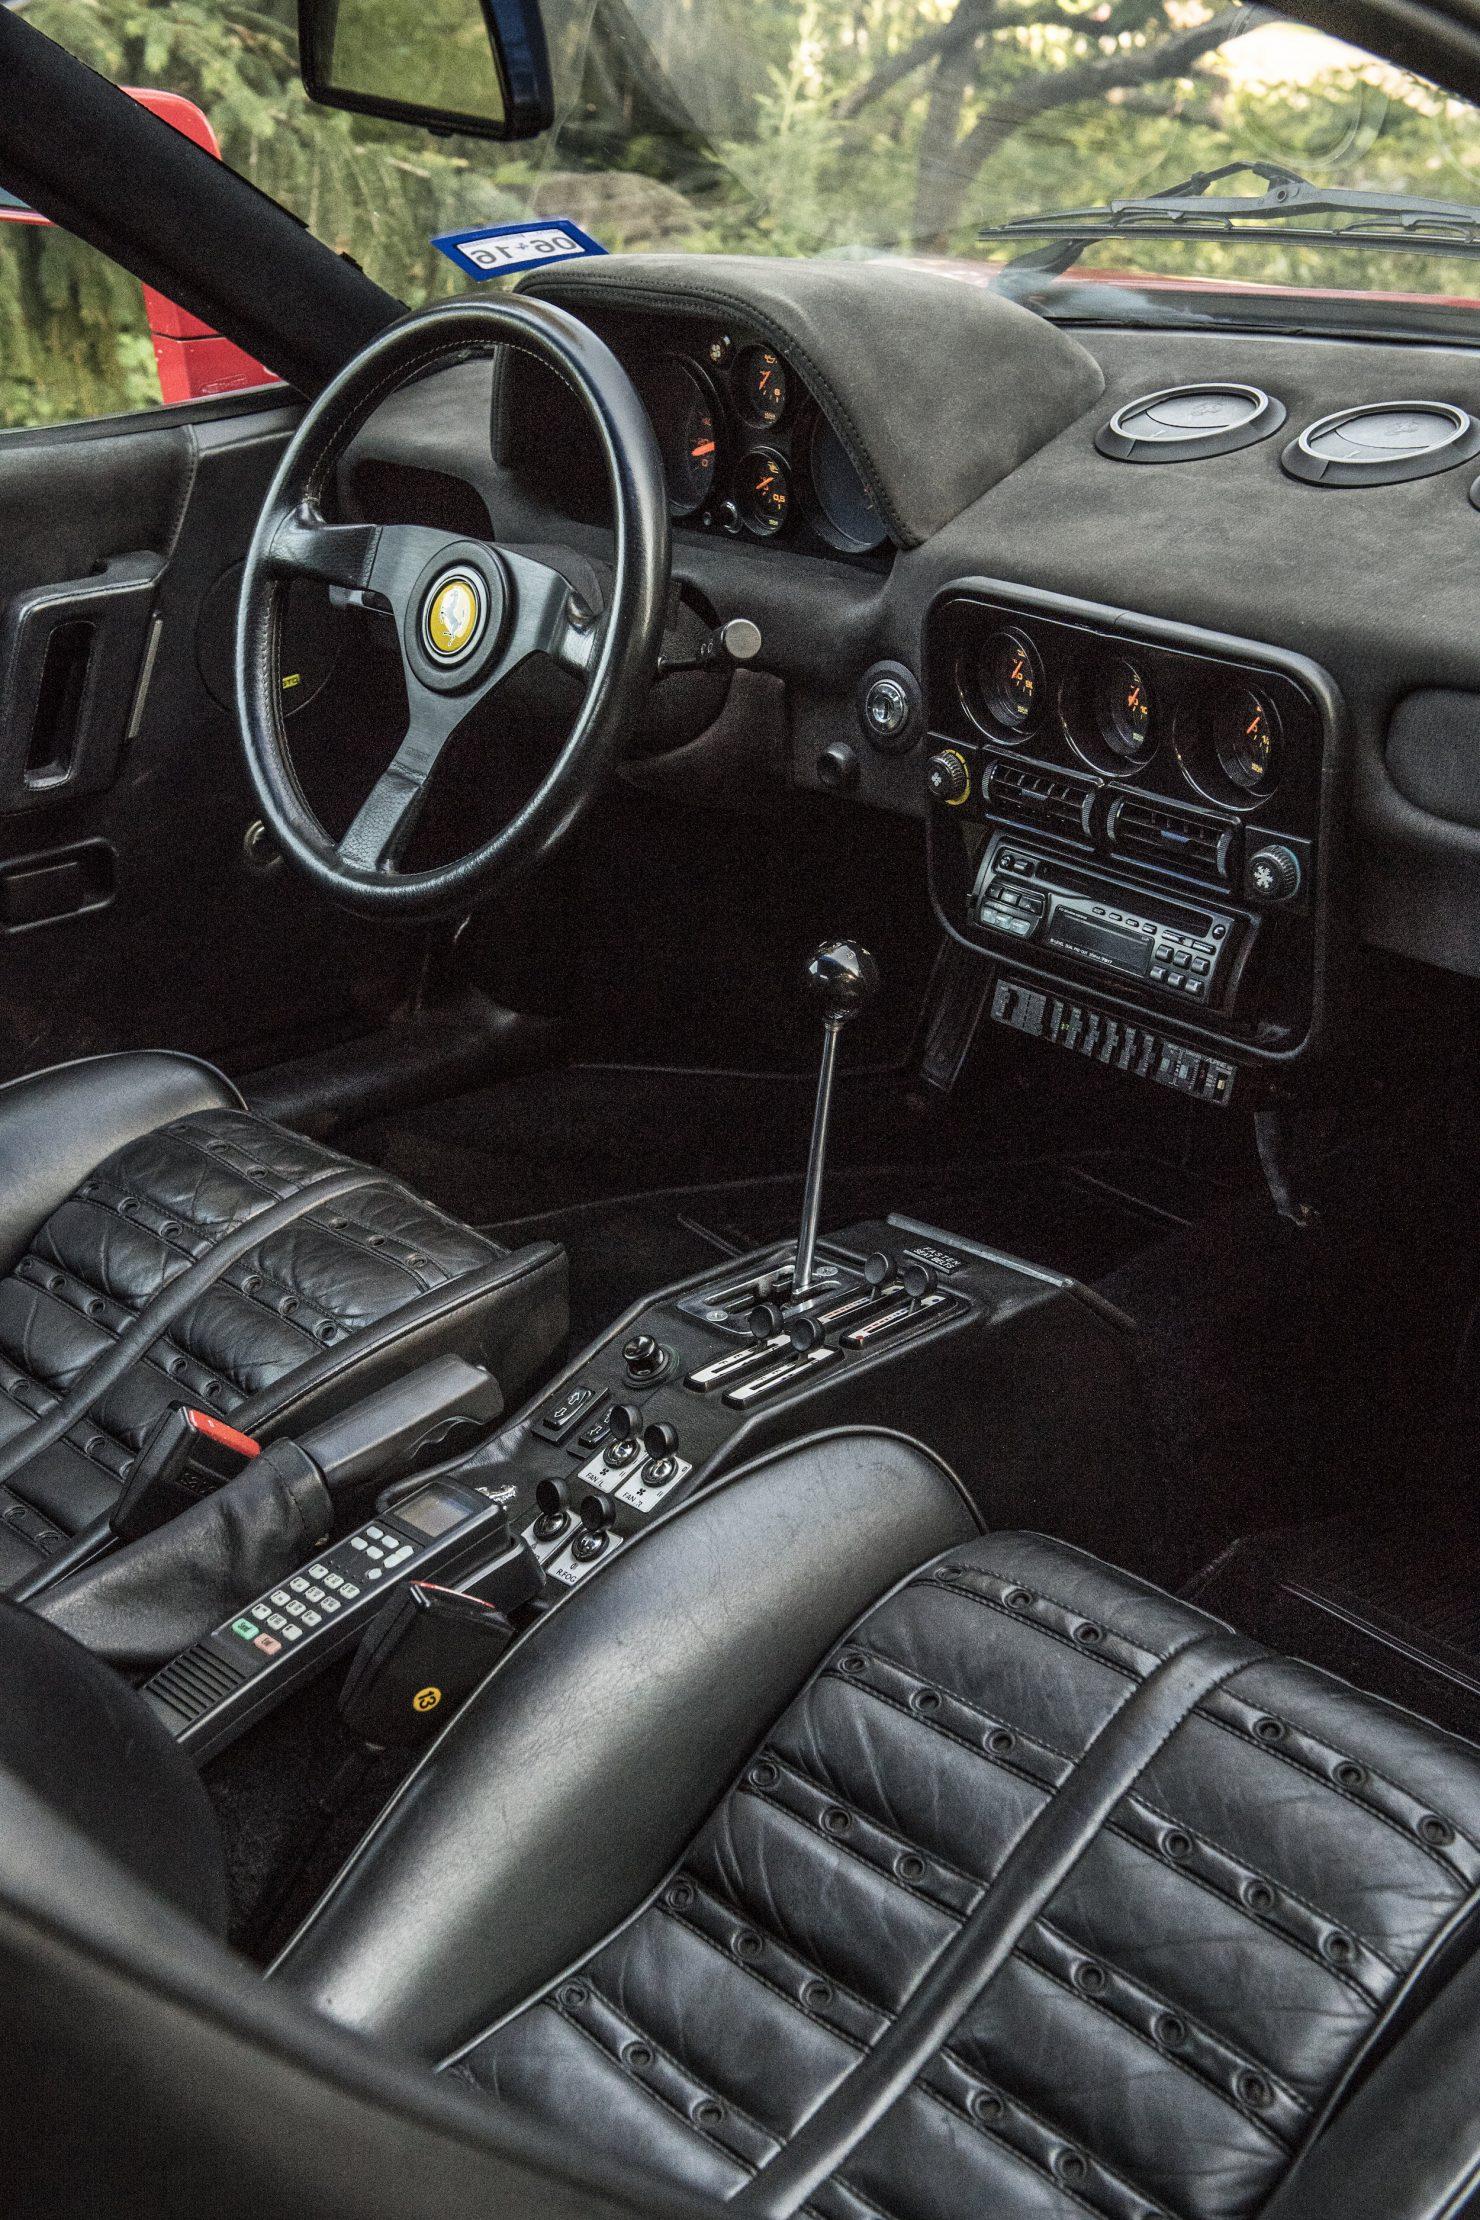 Ferrari 288 GTO 14 1480x2220 - 1985 Ferrari 288 GTO